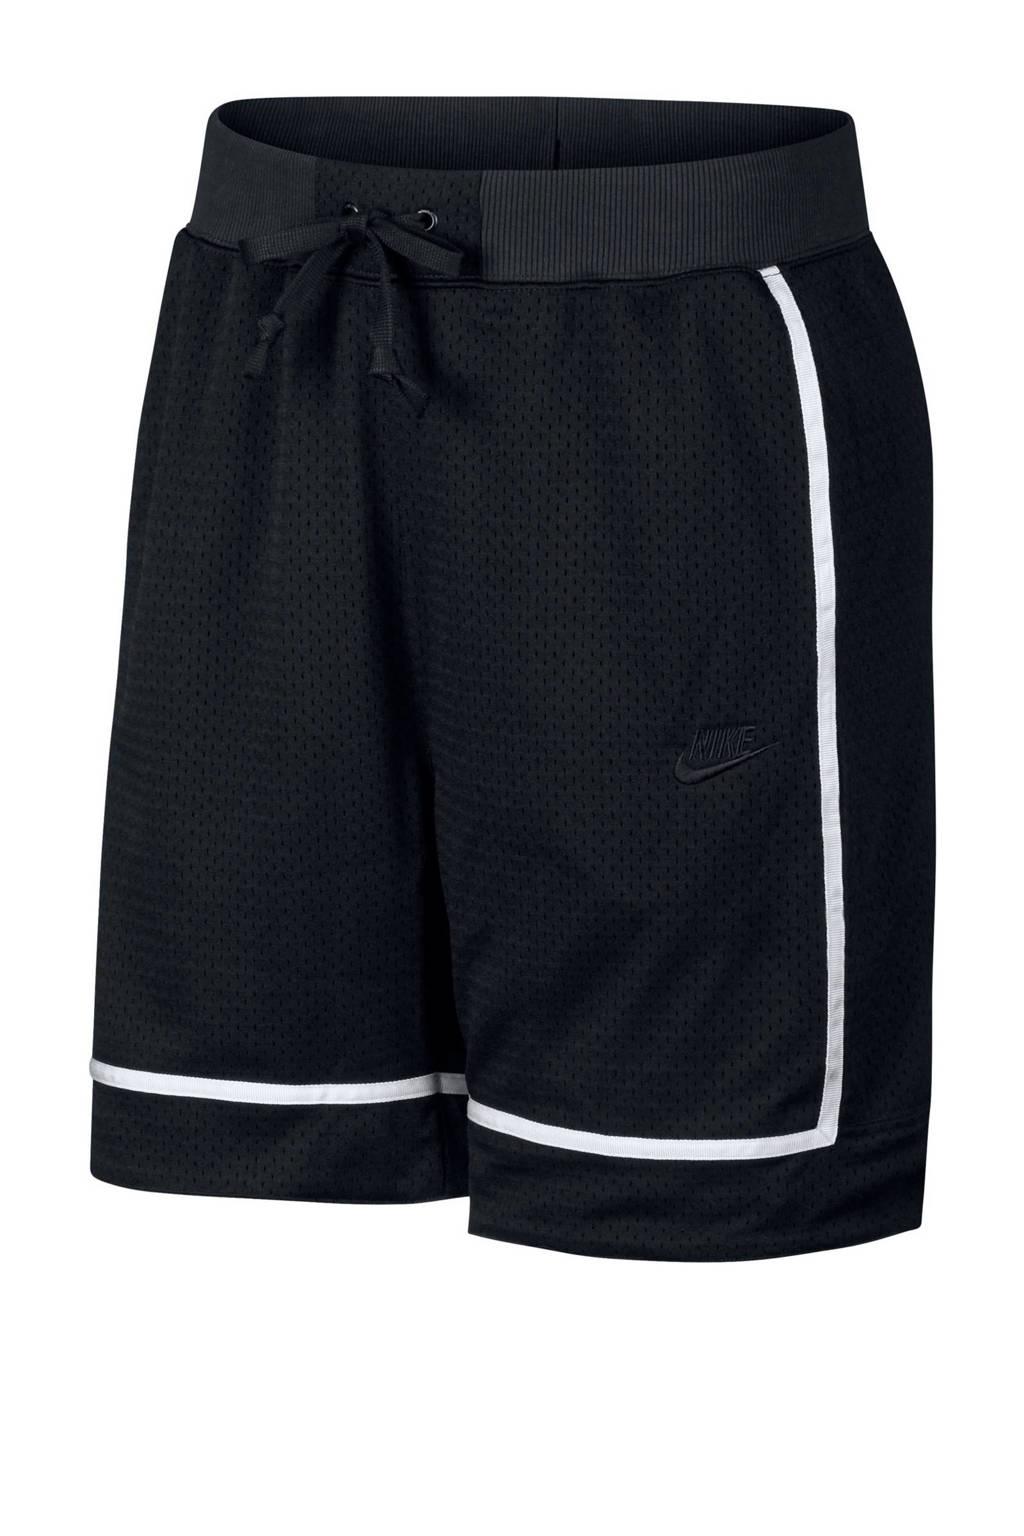 Nike   basketbalshort zwart, Zwart